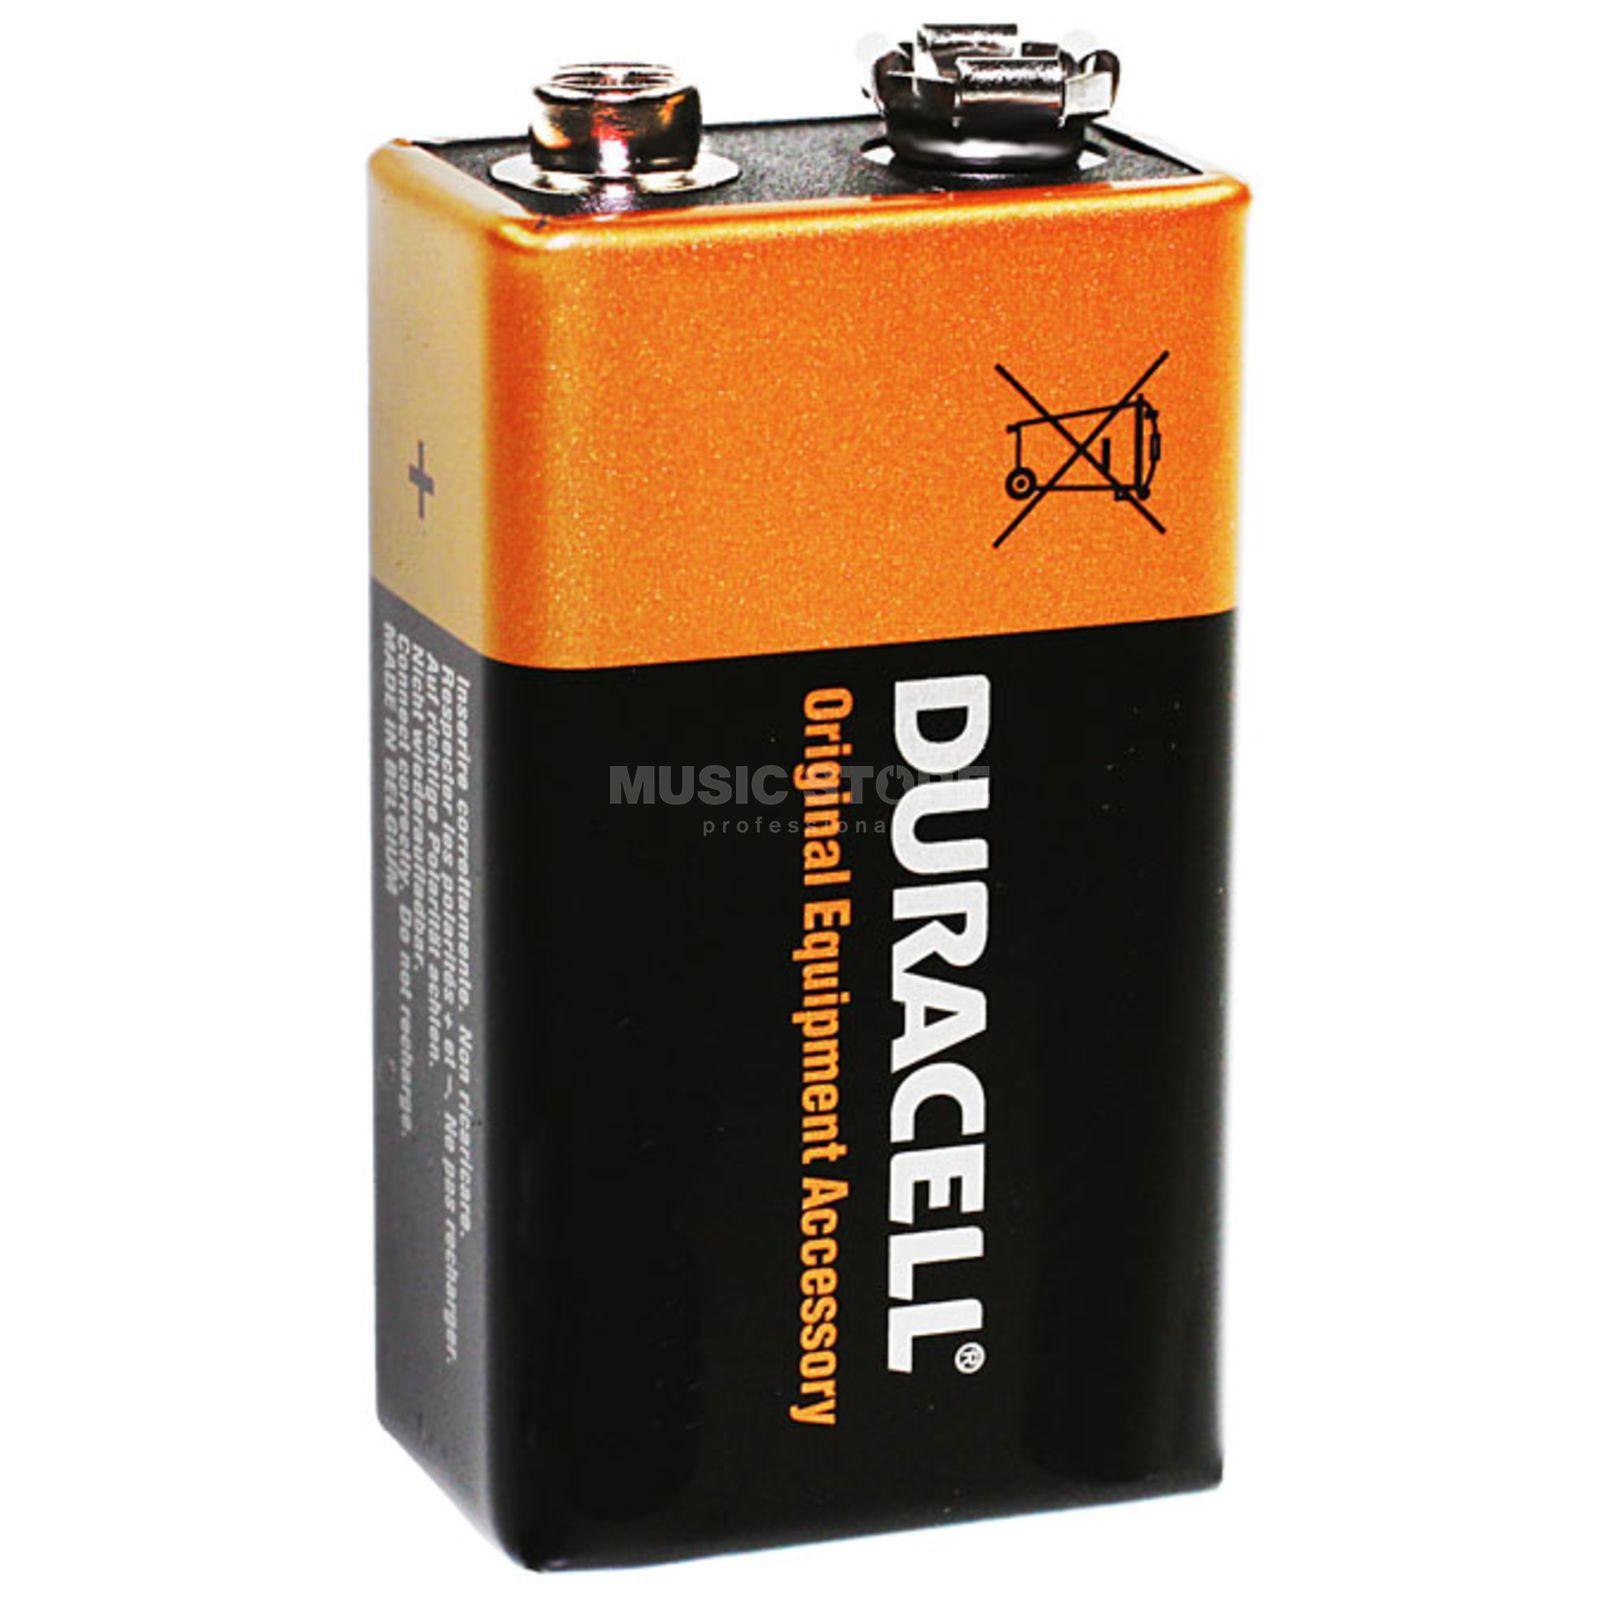 duracell 9v block batterie us type taylor guitars 1 ACC 000